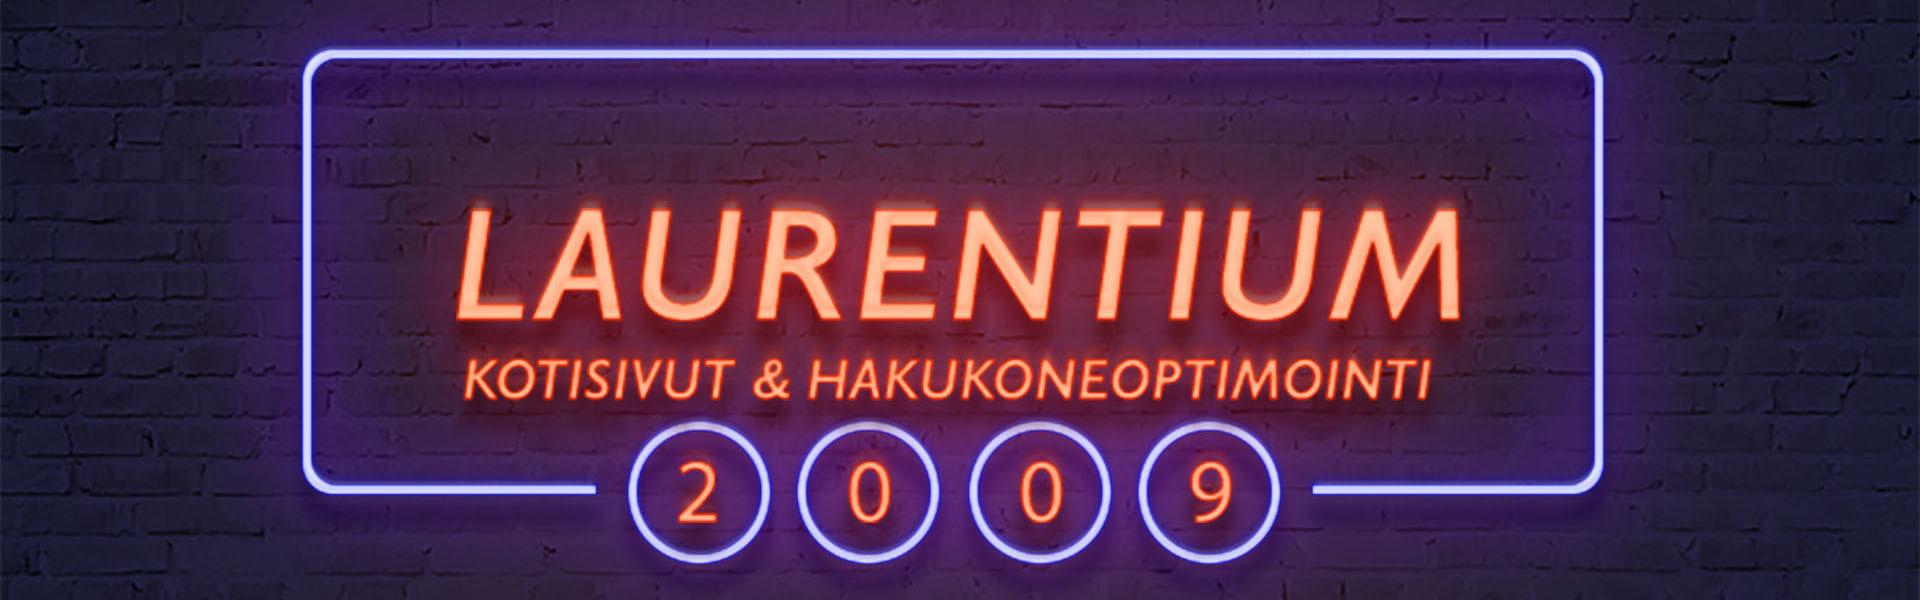 Kotisivut & Hakukoneoptimointi |Laurentium Oy • Tampere